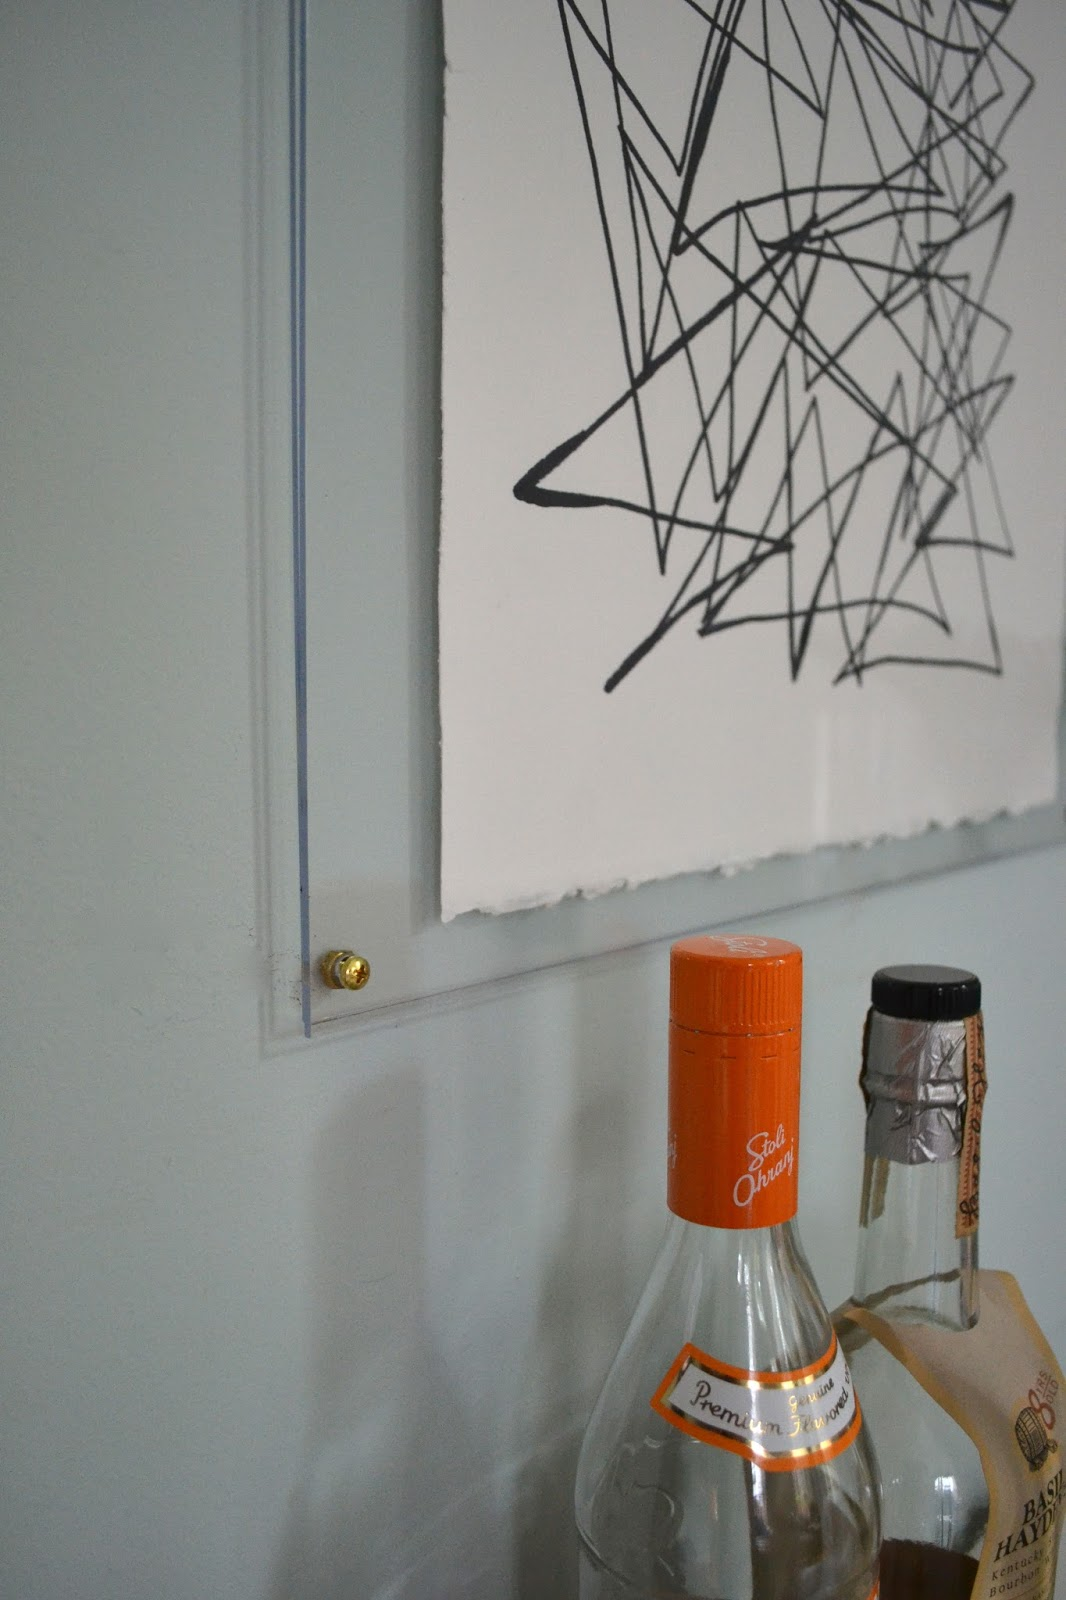 knock off ethan allen art (scribbling) in an acrylic frame ...